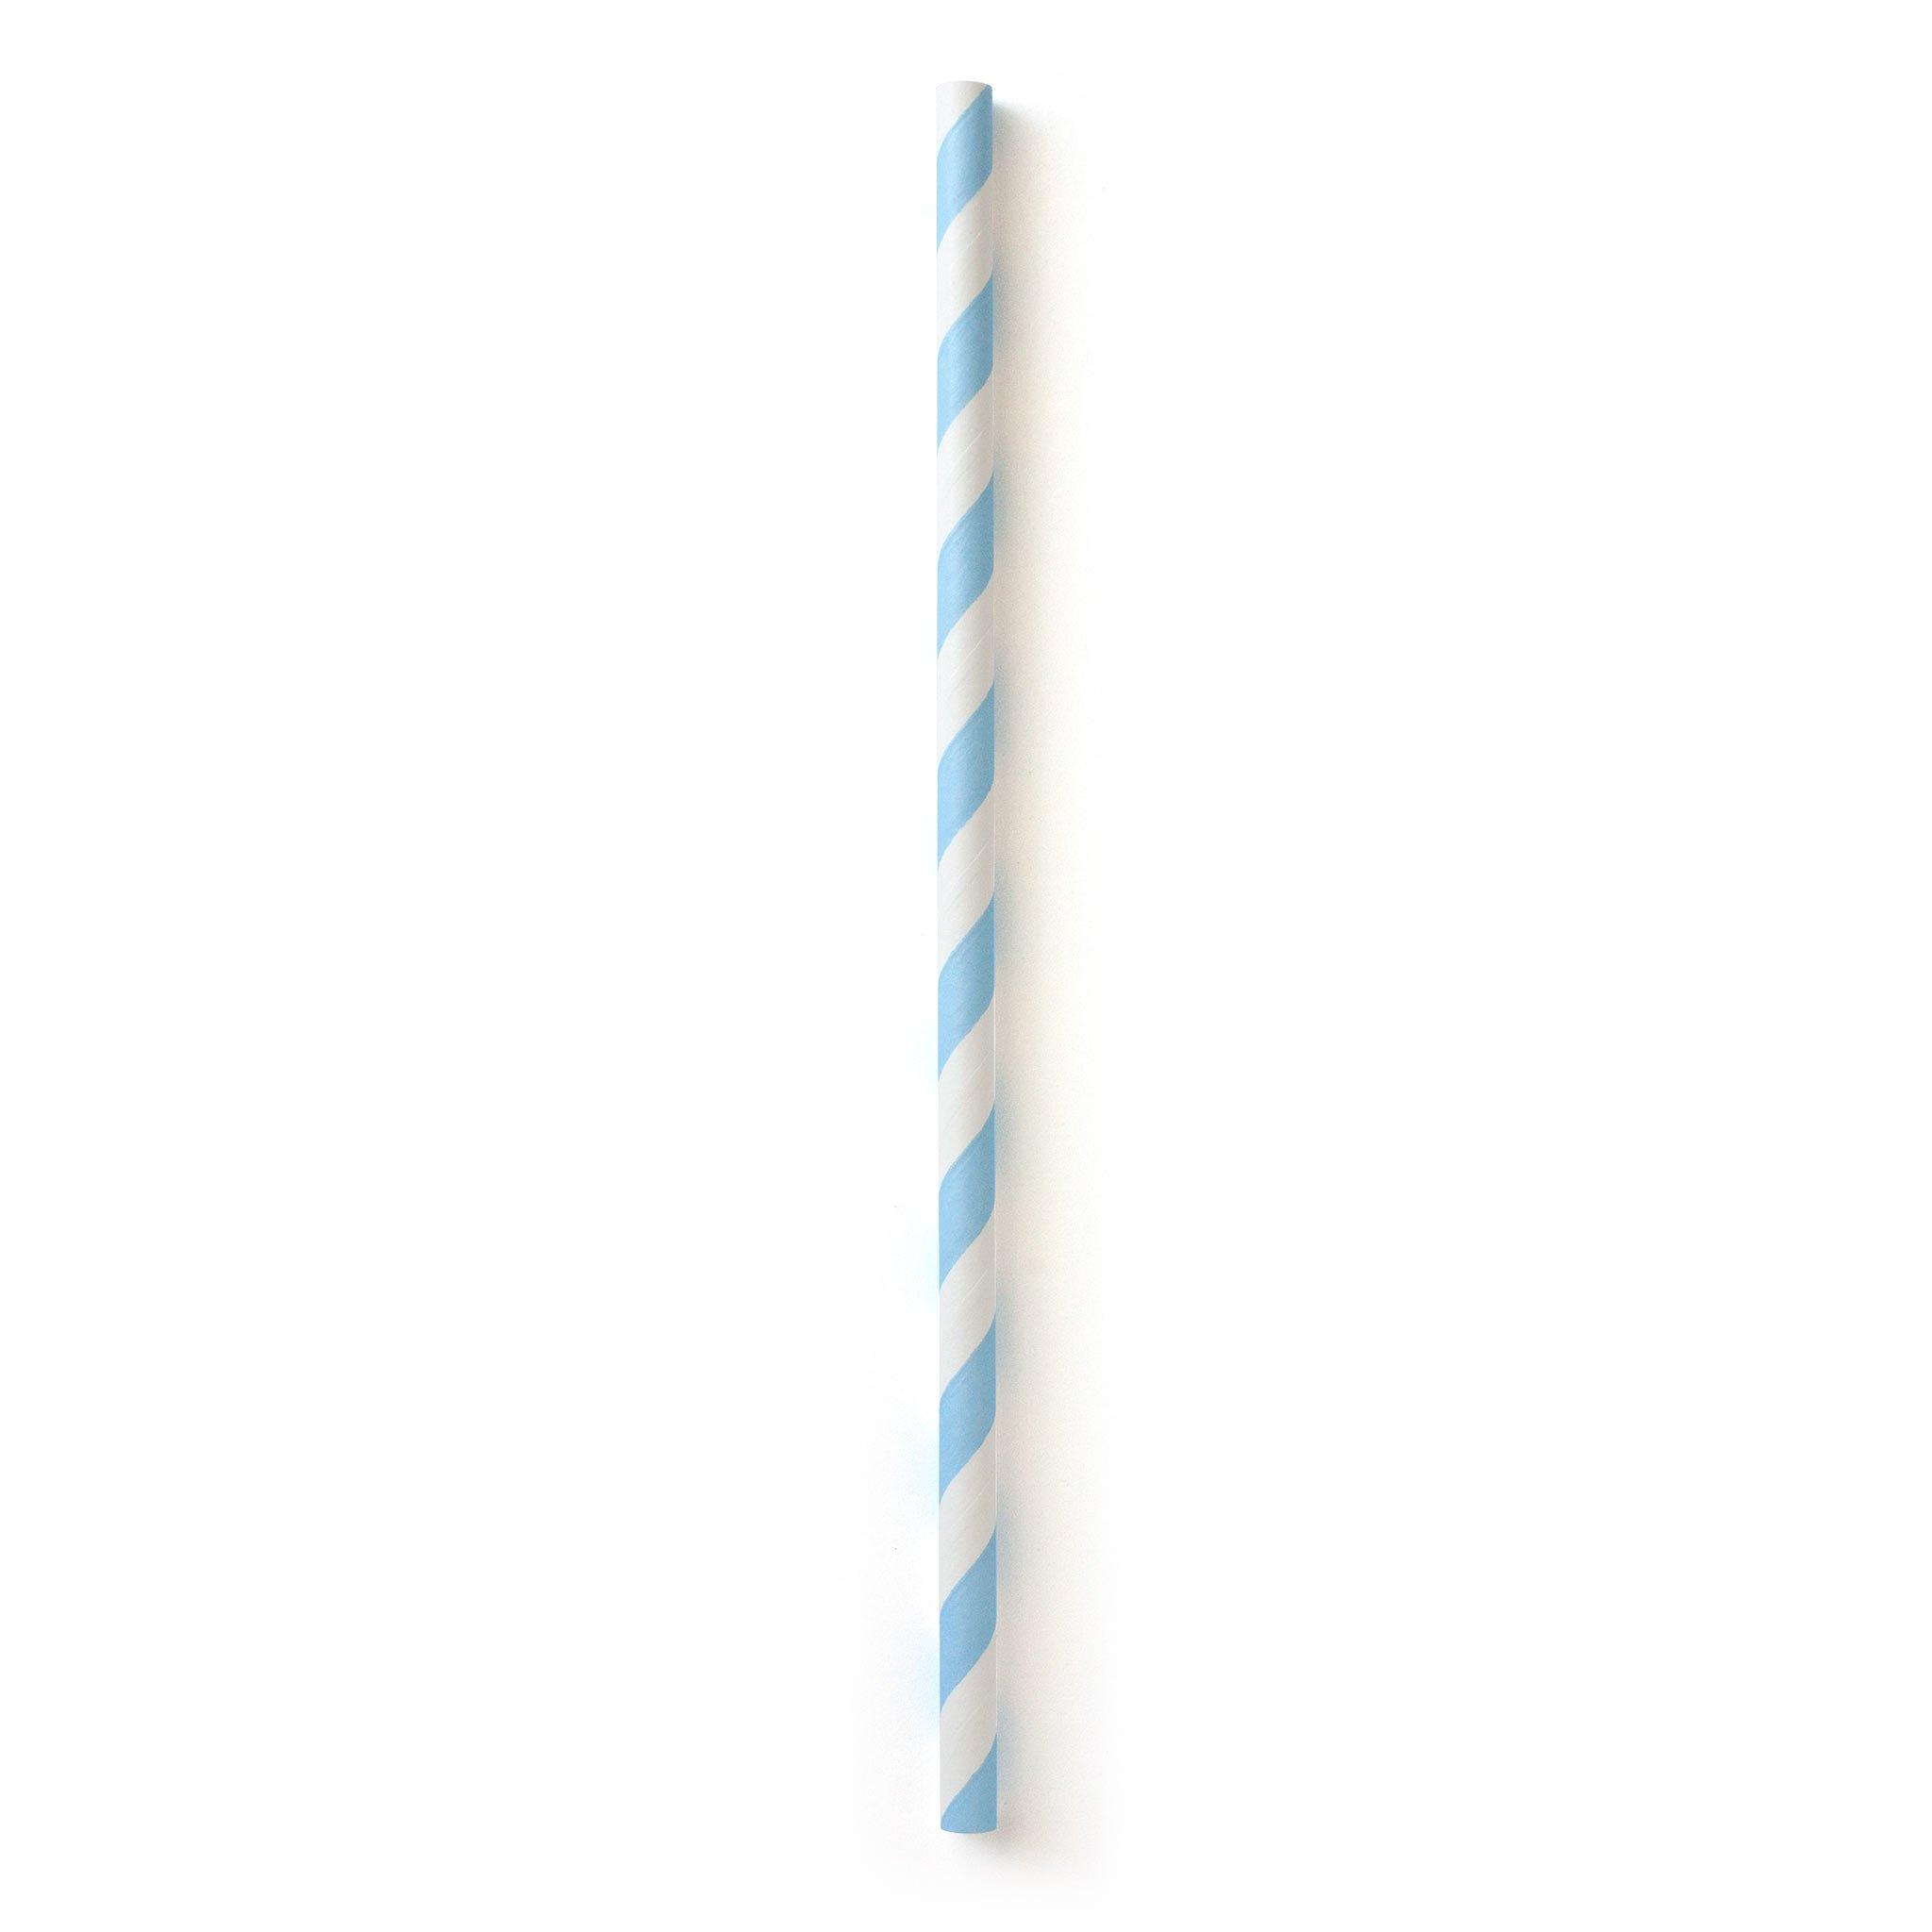 Susty Party Straw, Blue